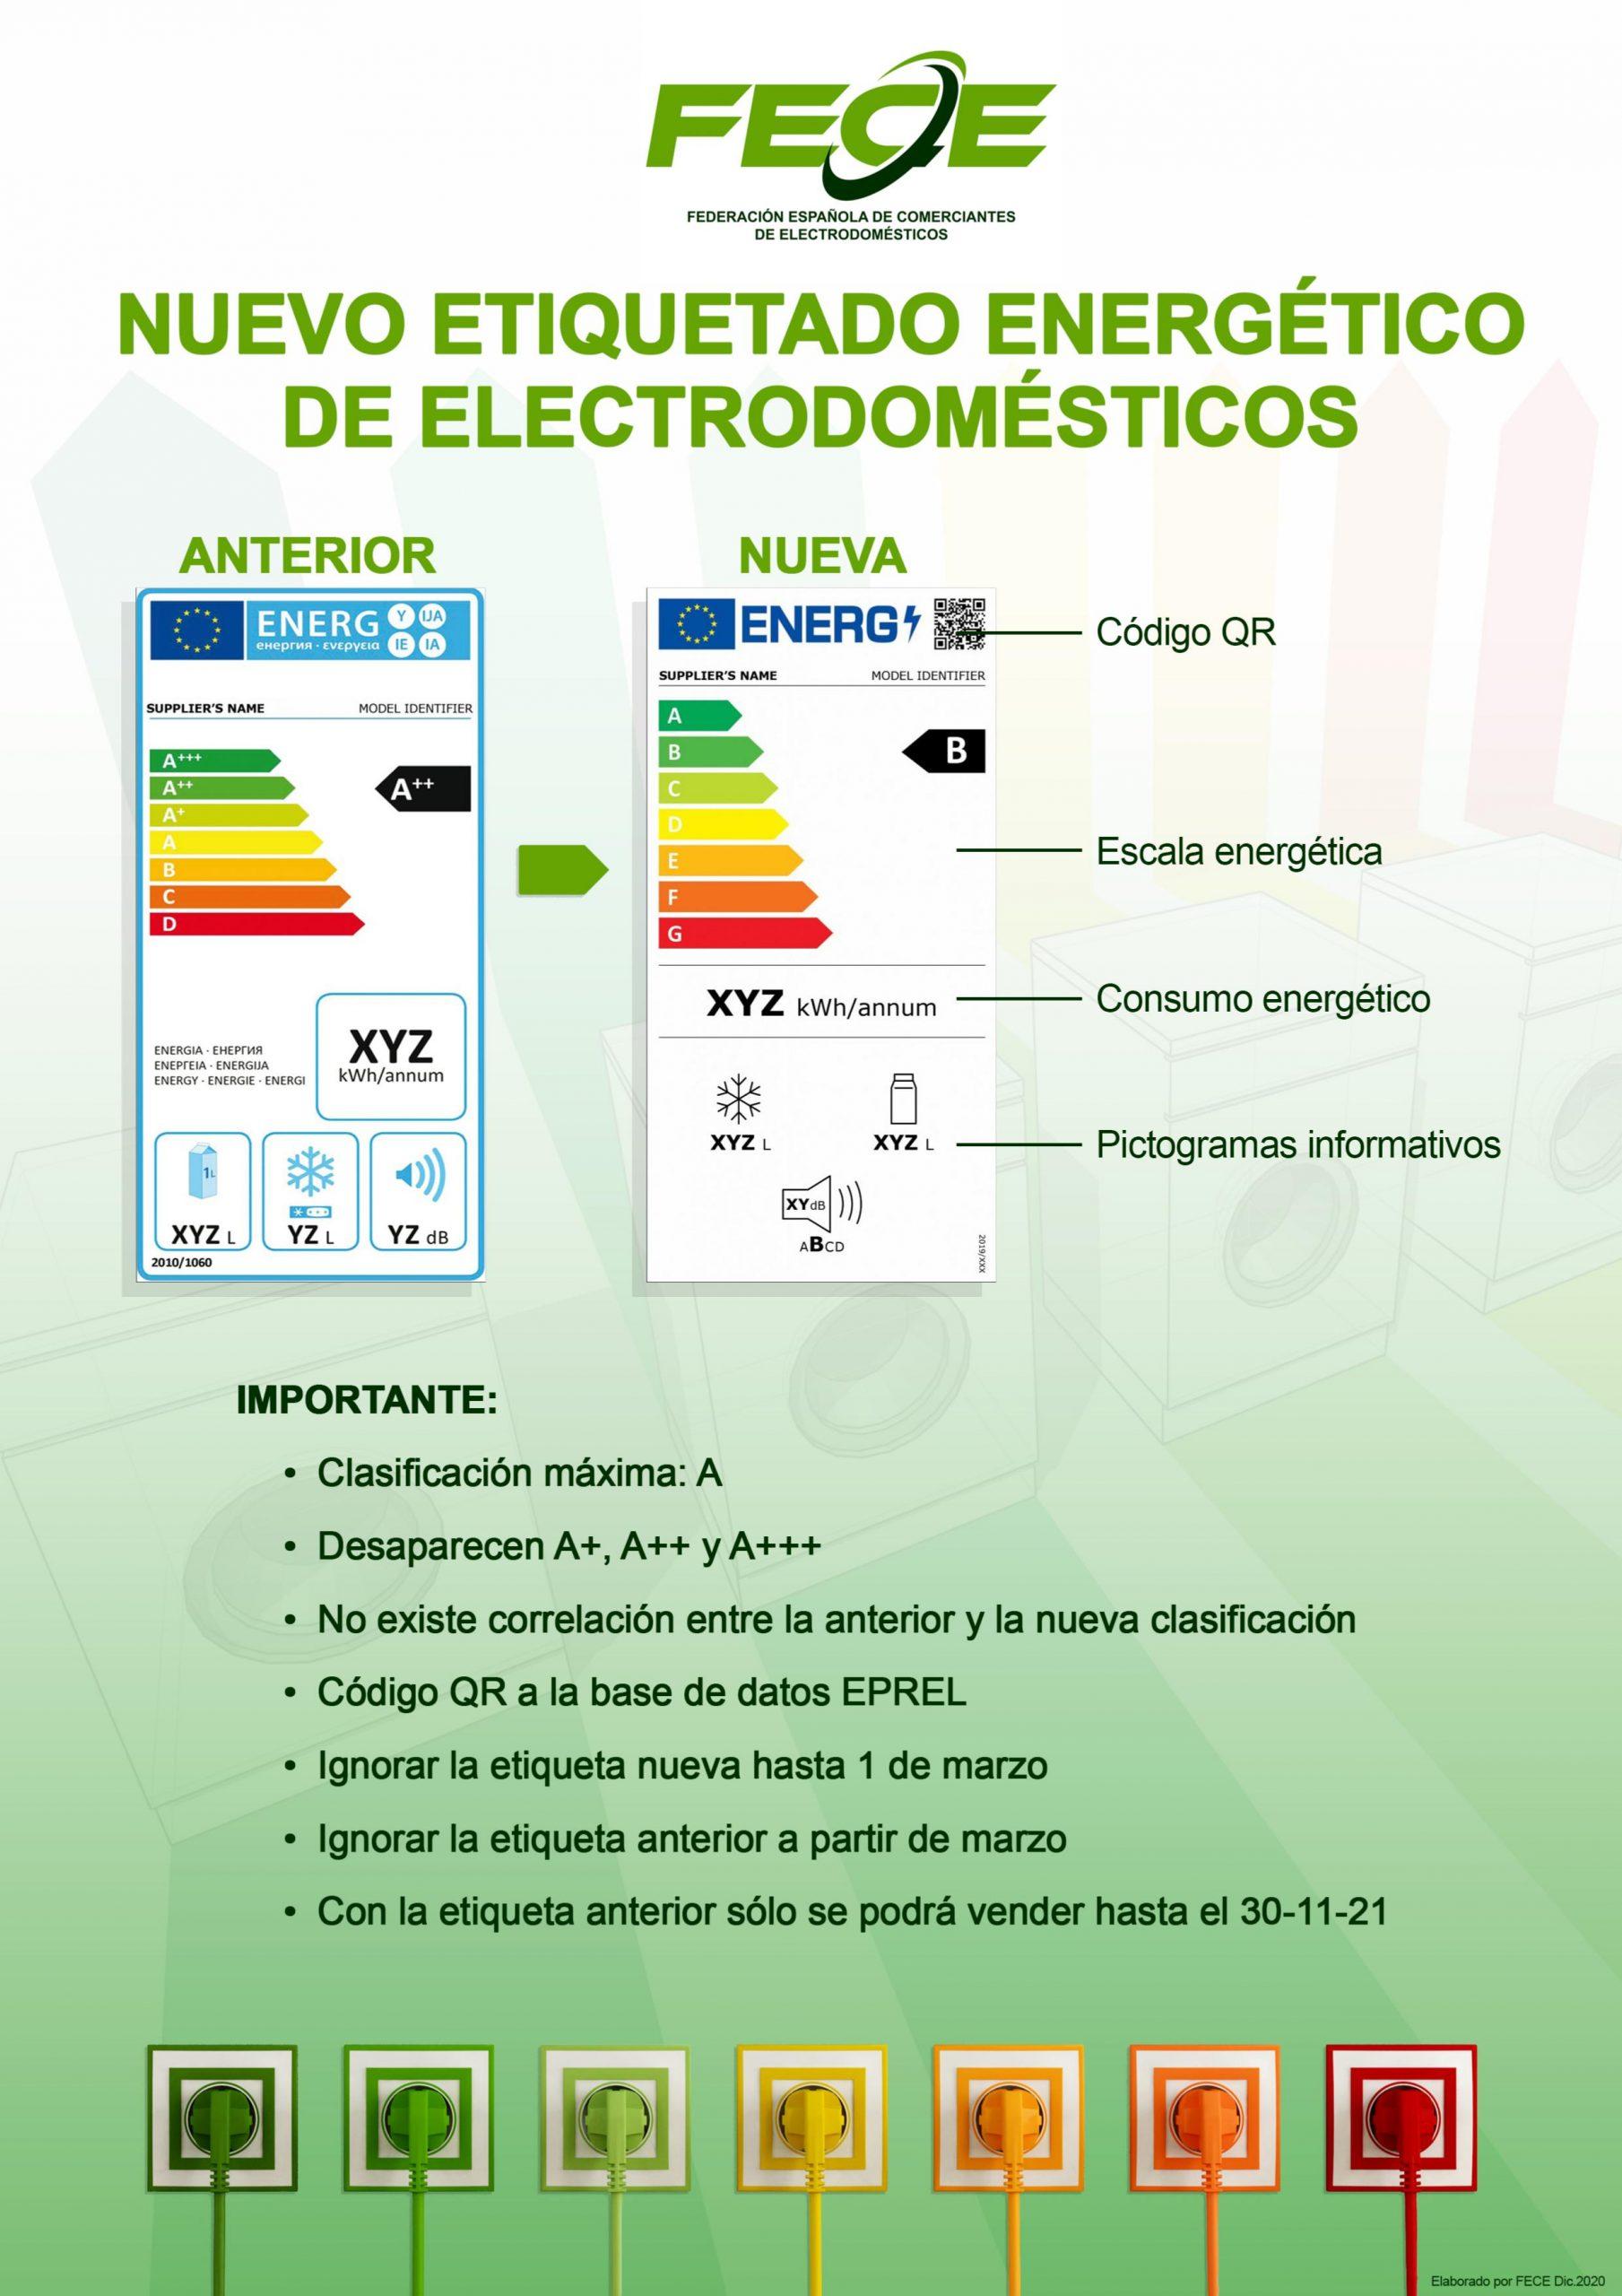 La importancia de la etiqueta energética: Clave para informar al consumidor